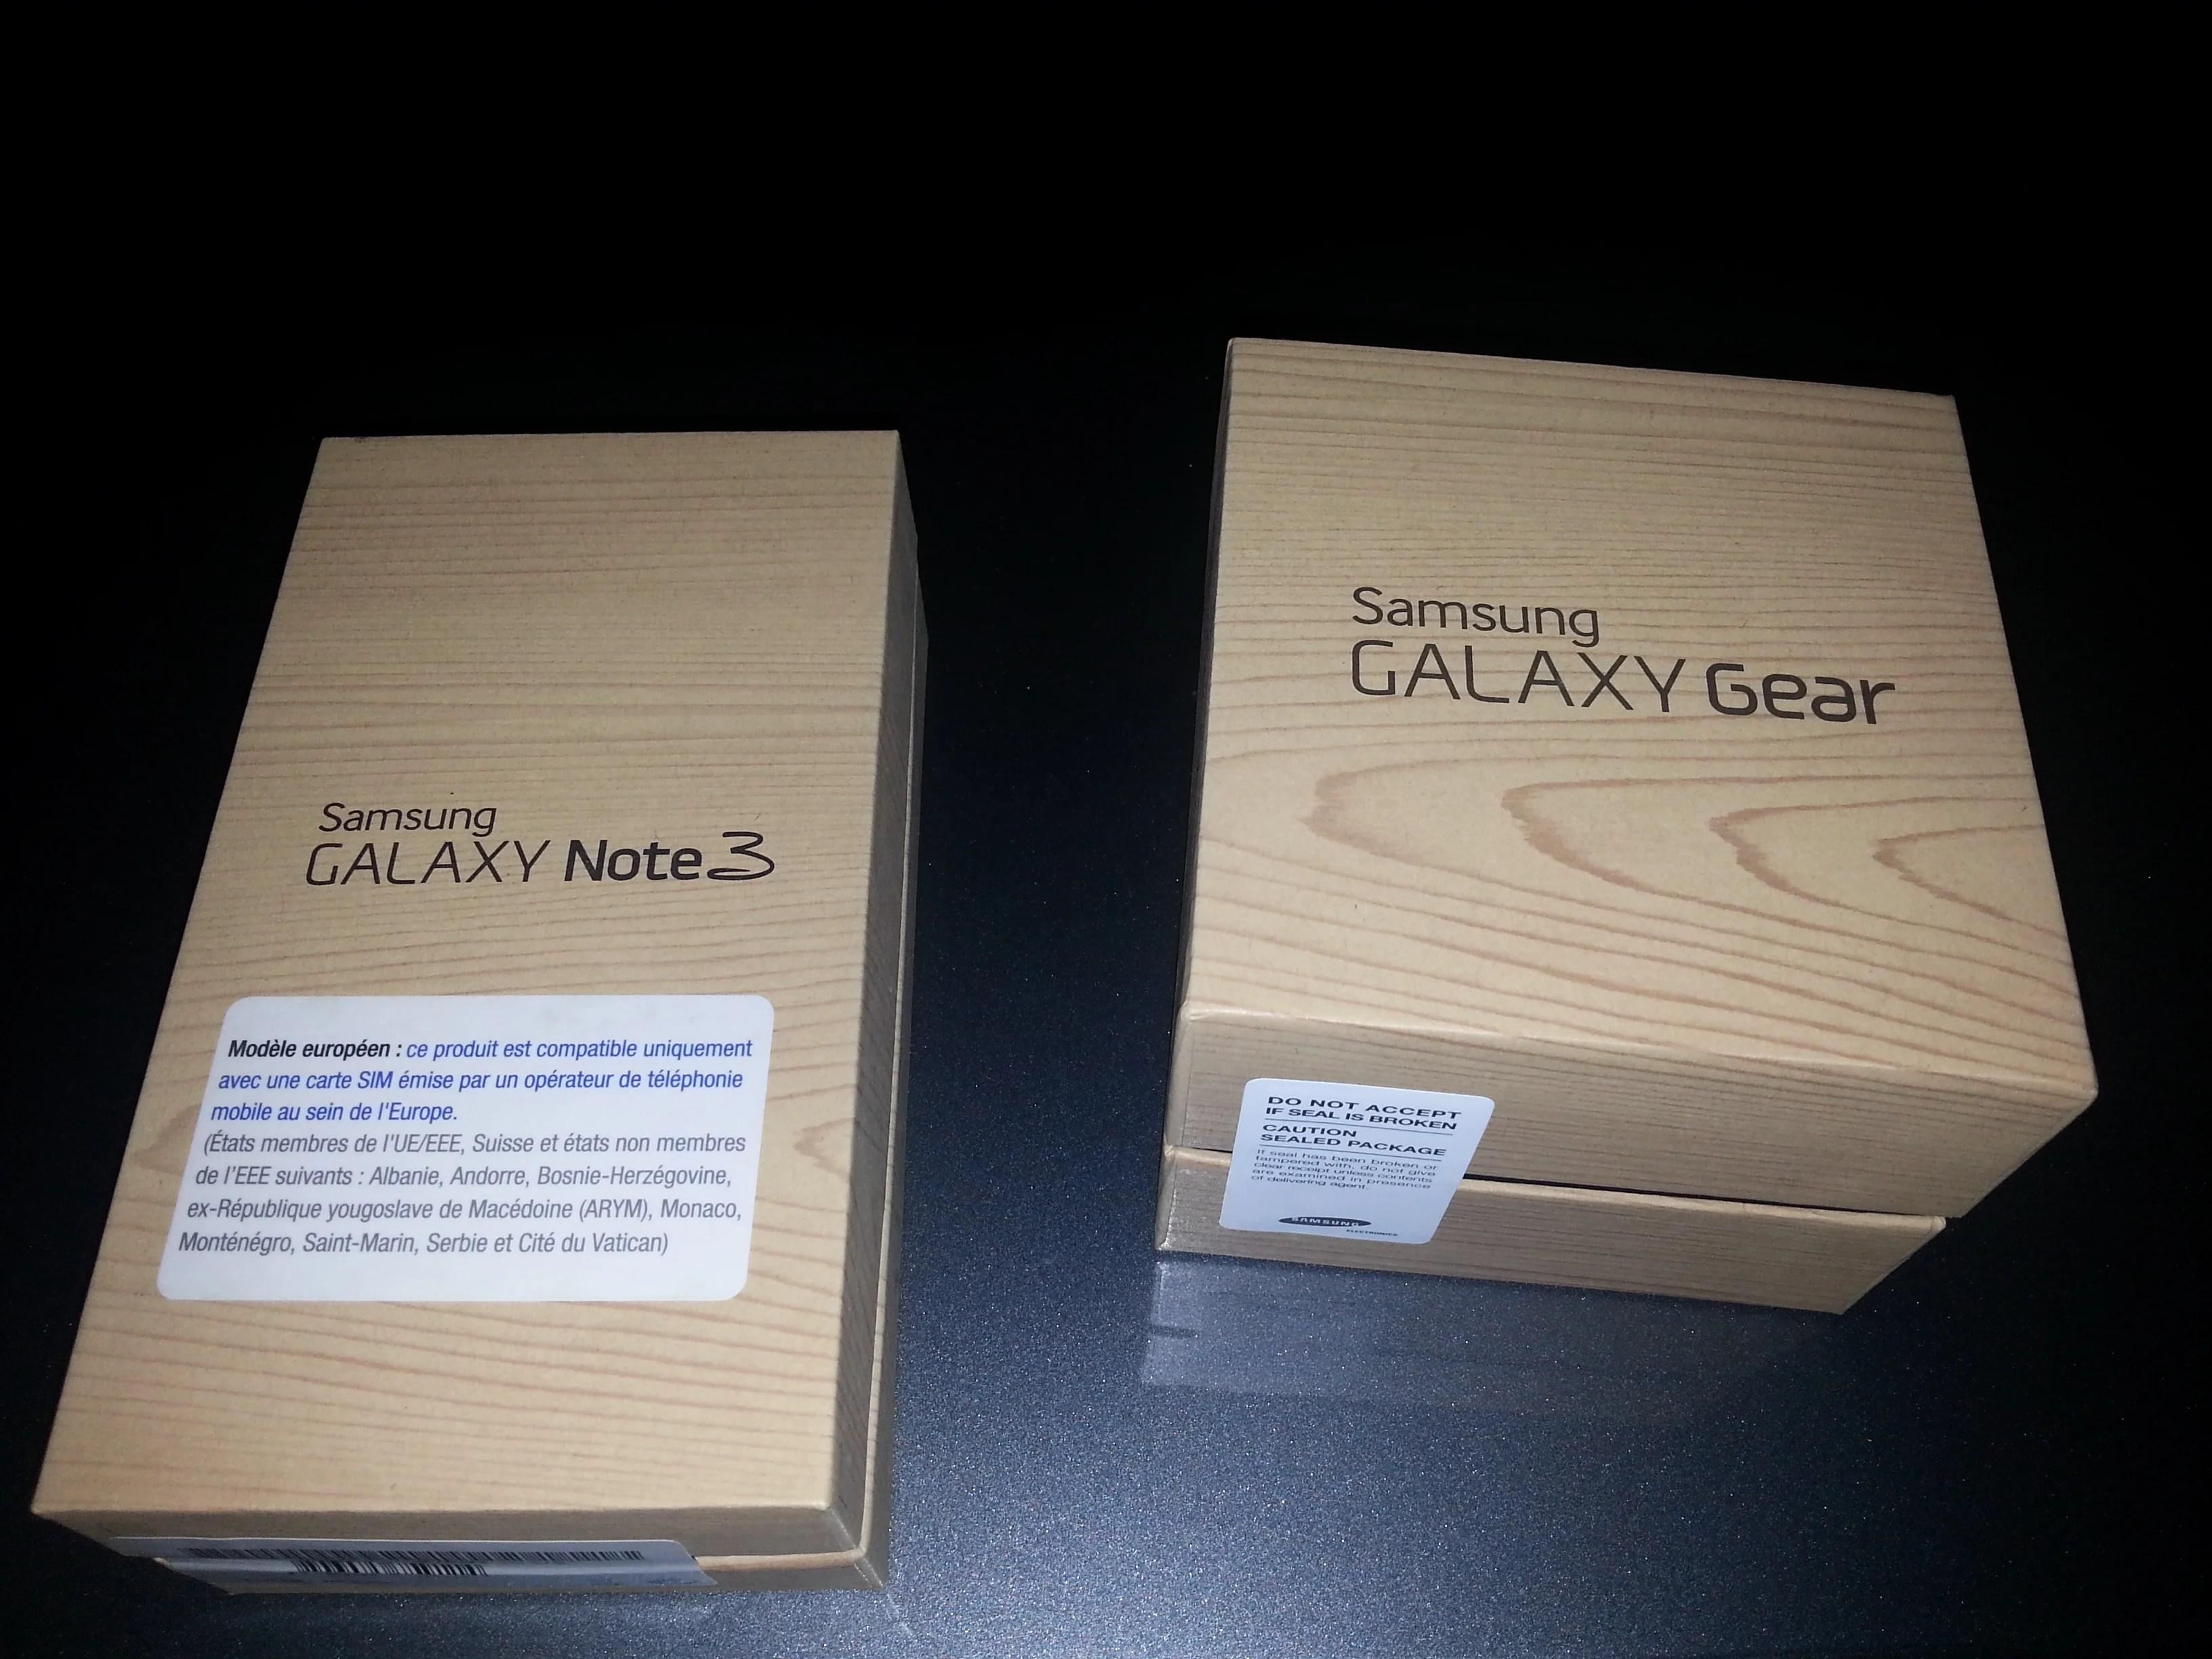 Samsung Galaxy Gear et Galaxy Note 3, l'avis d'un lecteur